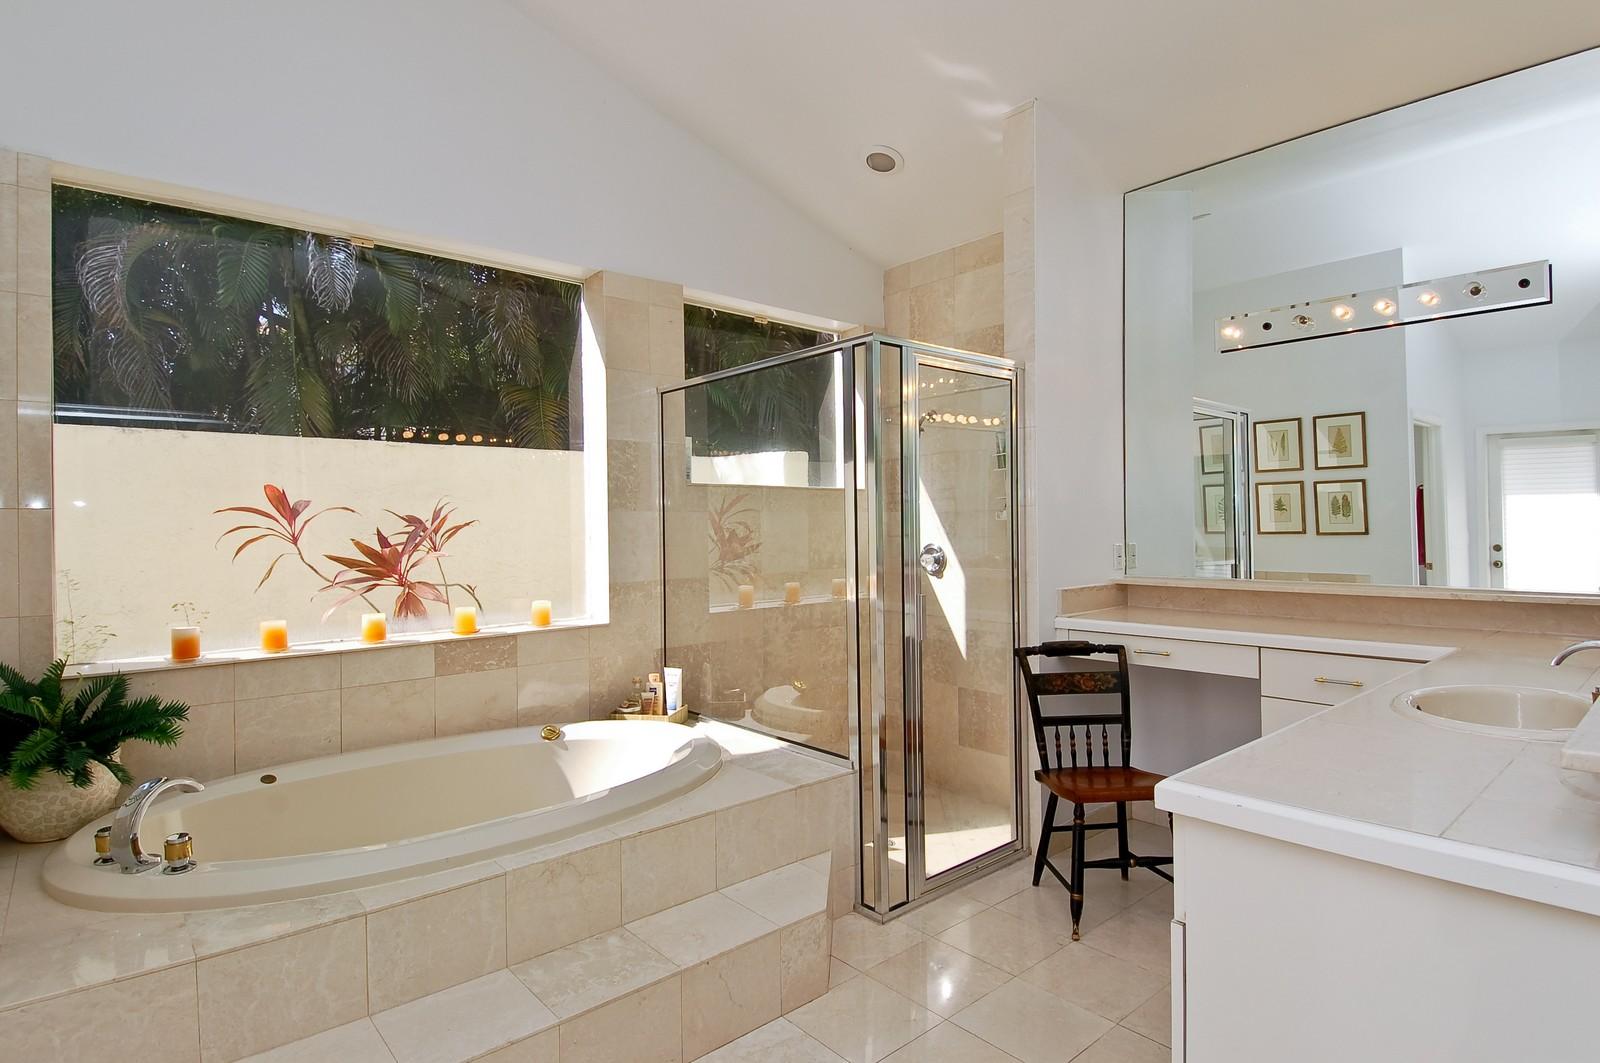 Real Estate Photography - 6329 NW 23rd Way, Boca Raton, FL, 33496 - Master Bathroom